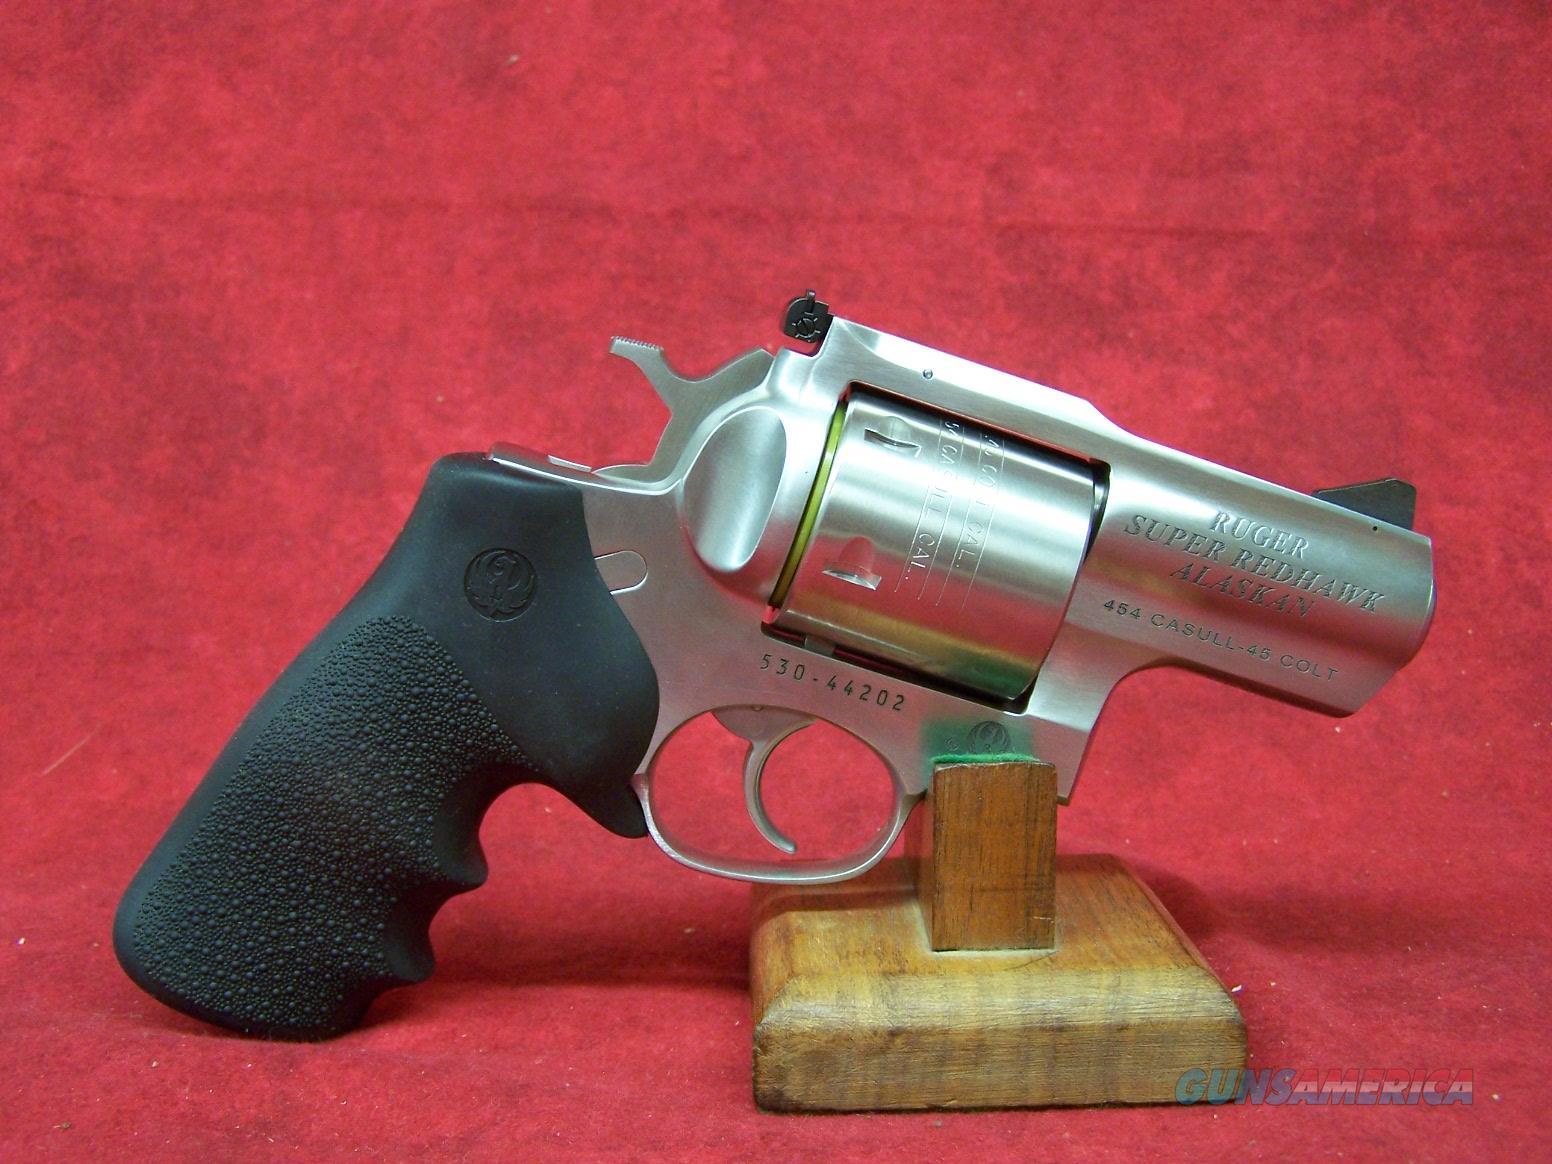 "Ruger Super Redhawk Alaskan .454 Casull 2.5"" Barrel Satin Stainless Steel 6 Round  KSRH-2454 (05301)  Guns > Pistols > Ruger Double Action Revolver > Redhawk Type"